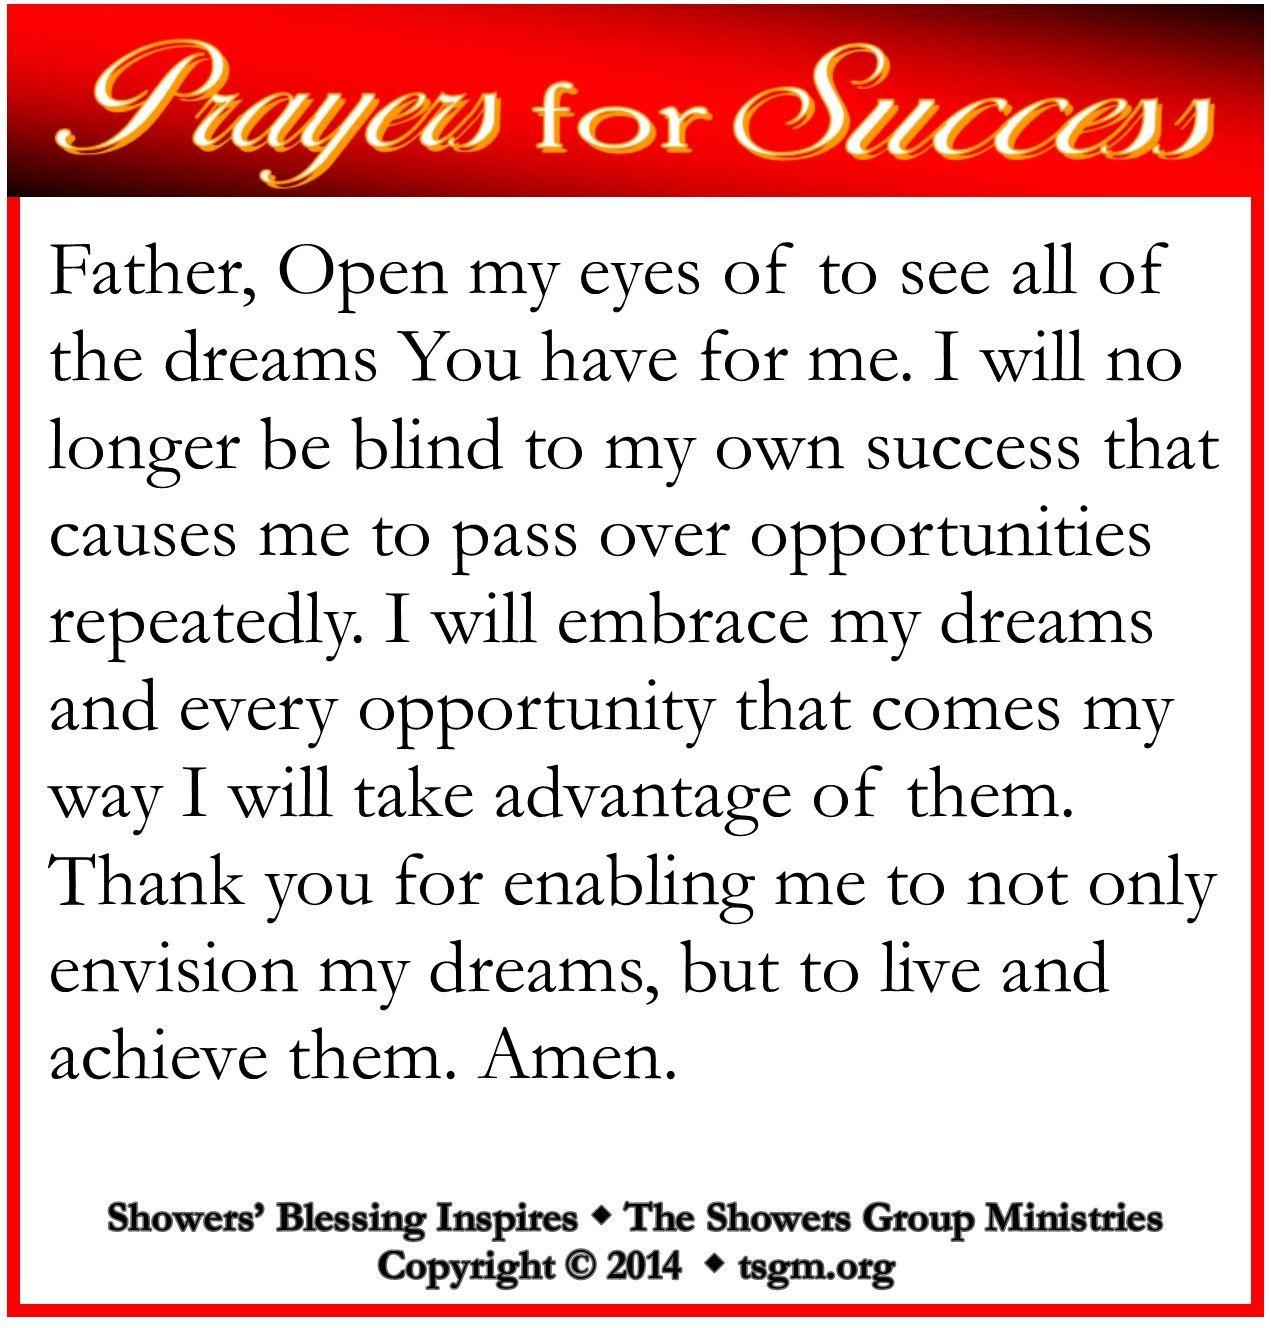 PRAYER FOR SUCCESS Jun 25 | Prayer | Prayer for success